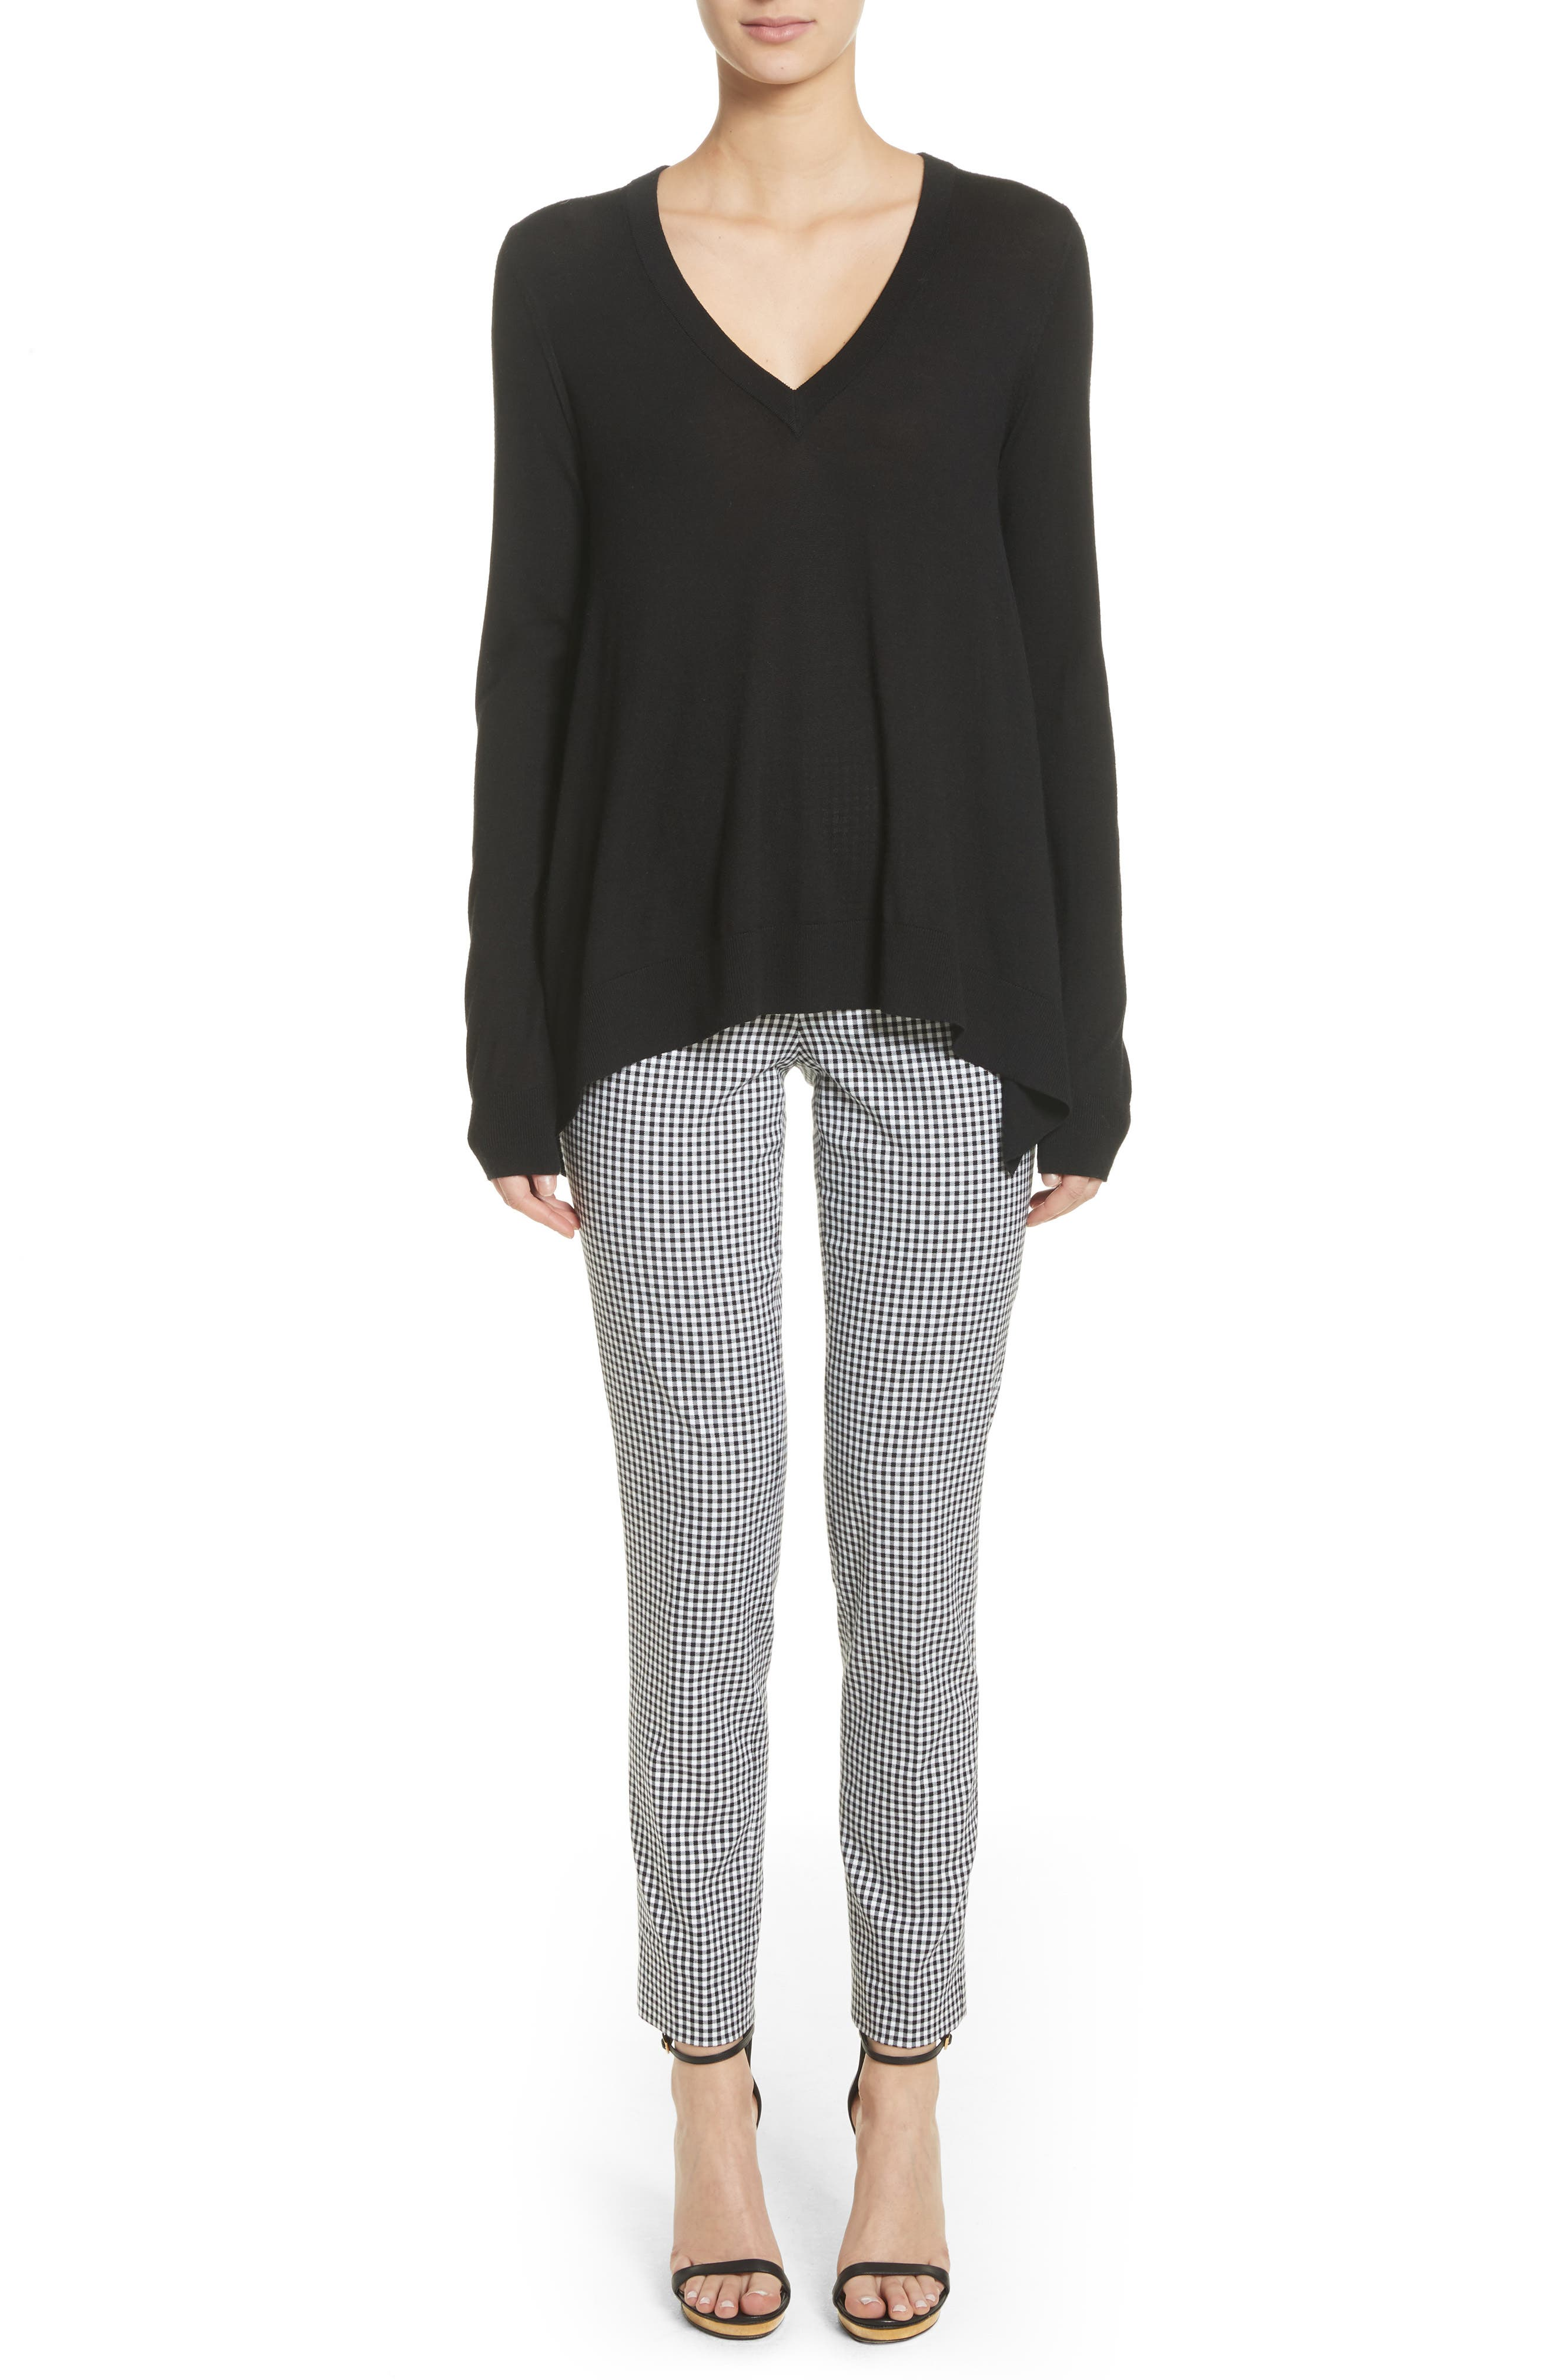 Gingham Stretch Cotton Pants,                             Alternate thumbnail 2, color,                             Black / White